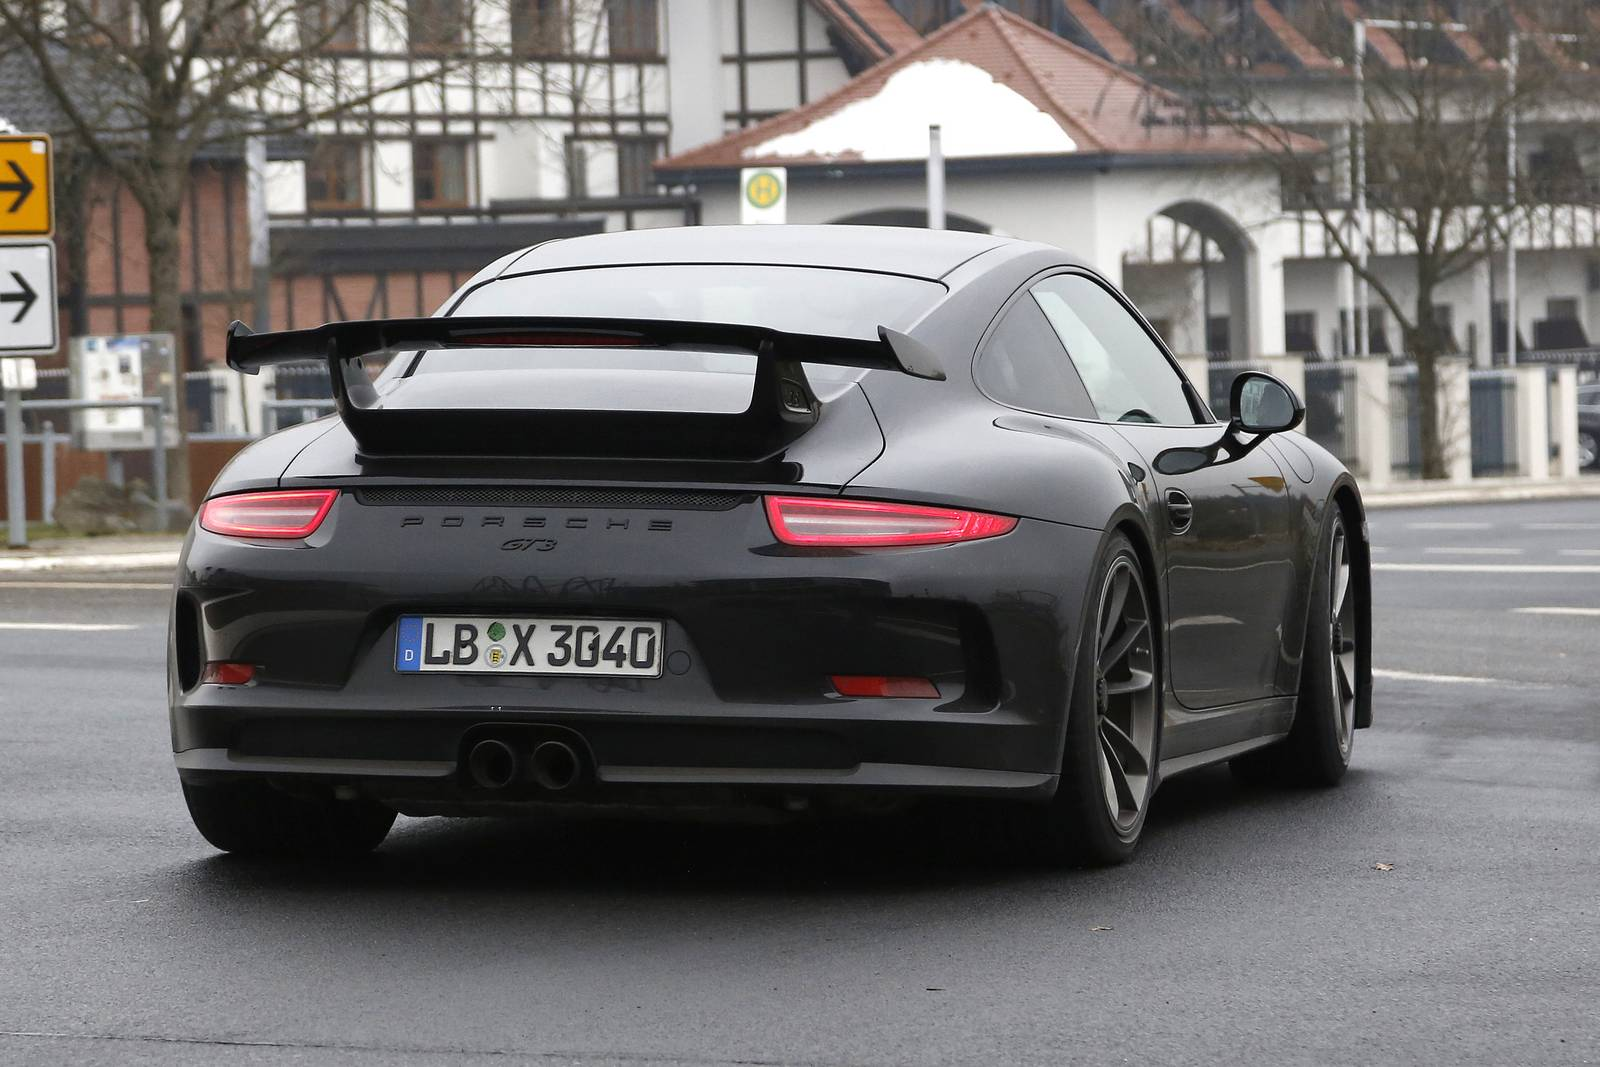 2017 Porsche 911 GT3 to Get Manual Gearbox Option - GTspirit